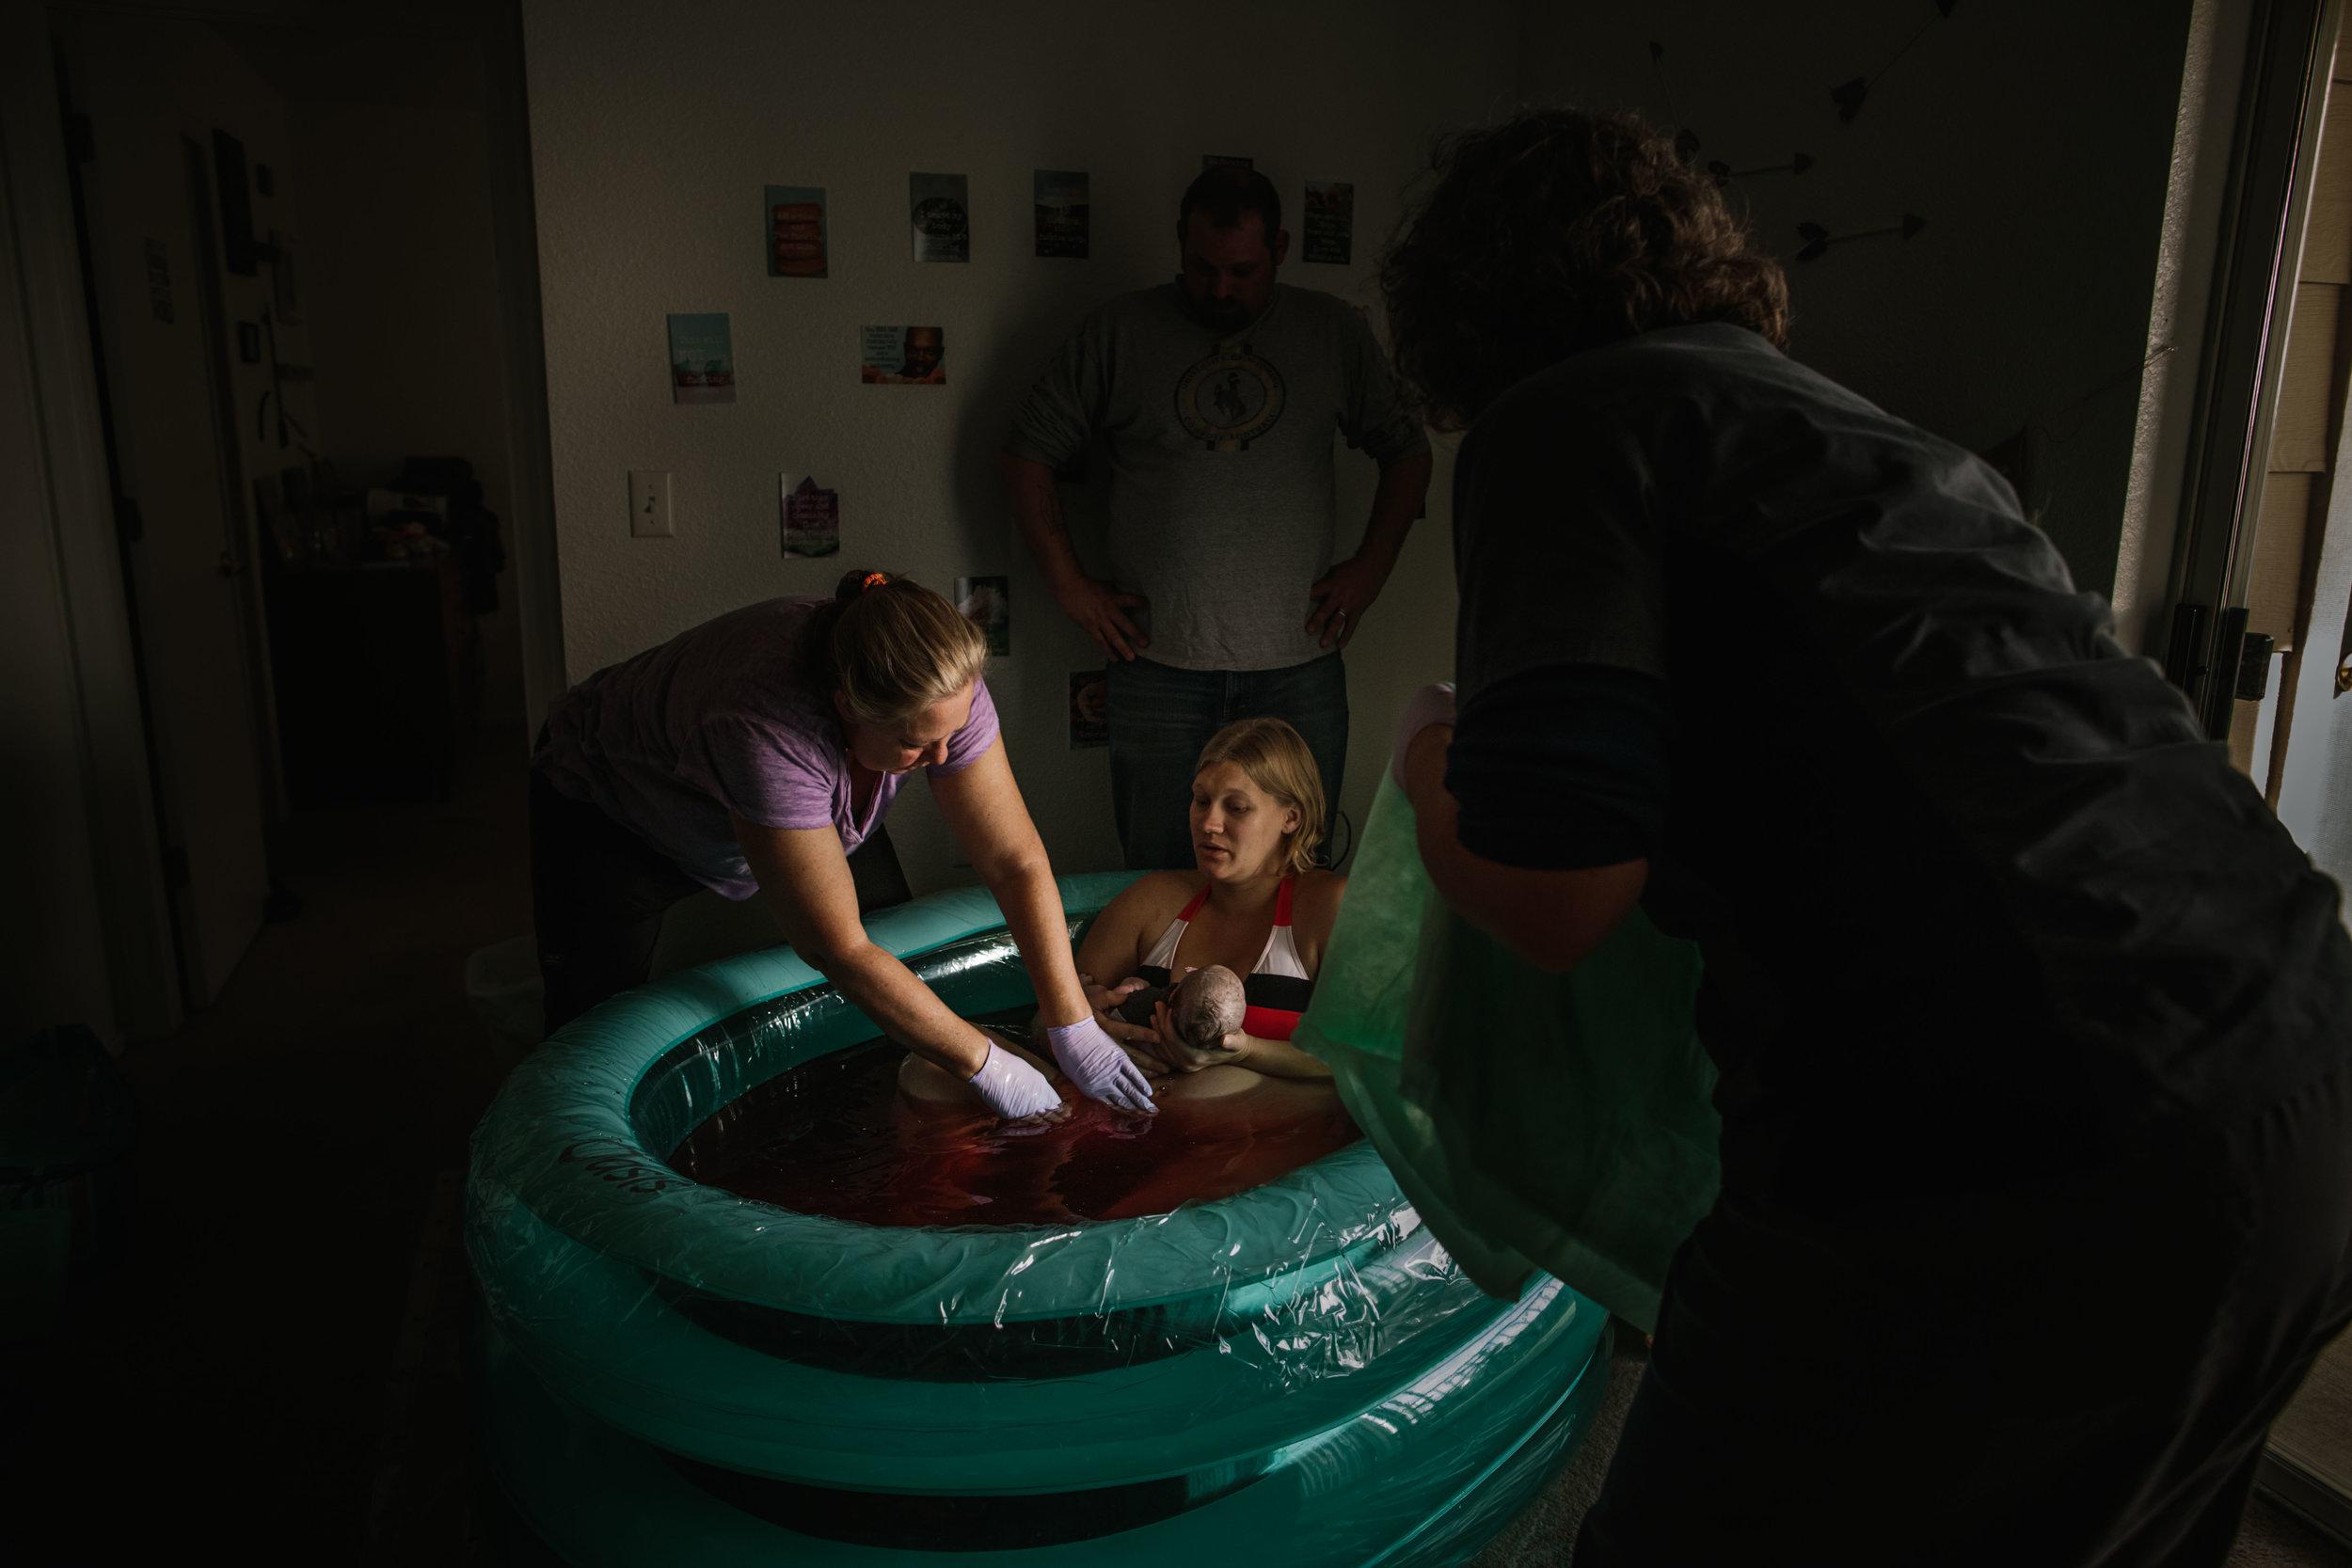 candice birth, cheyenne birth photographer-49.jpg